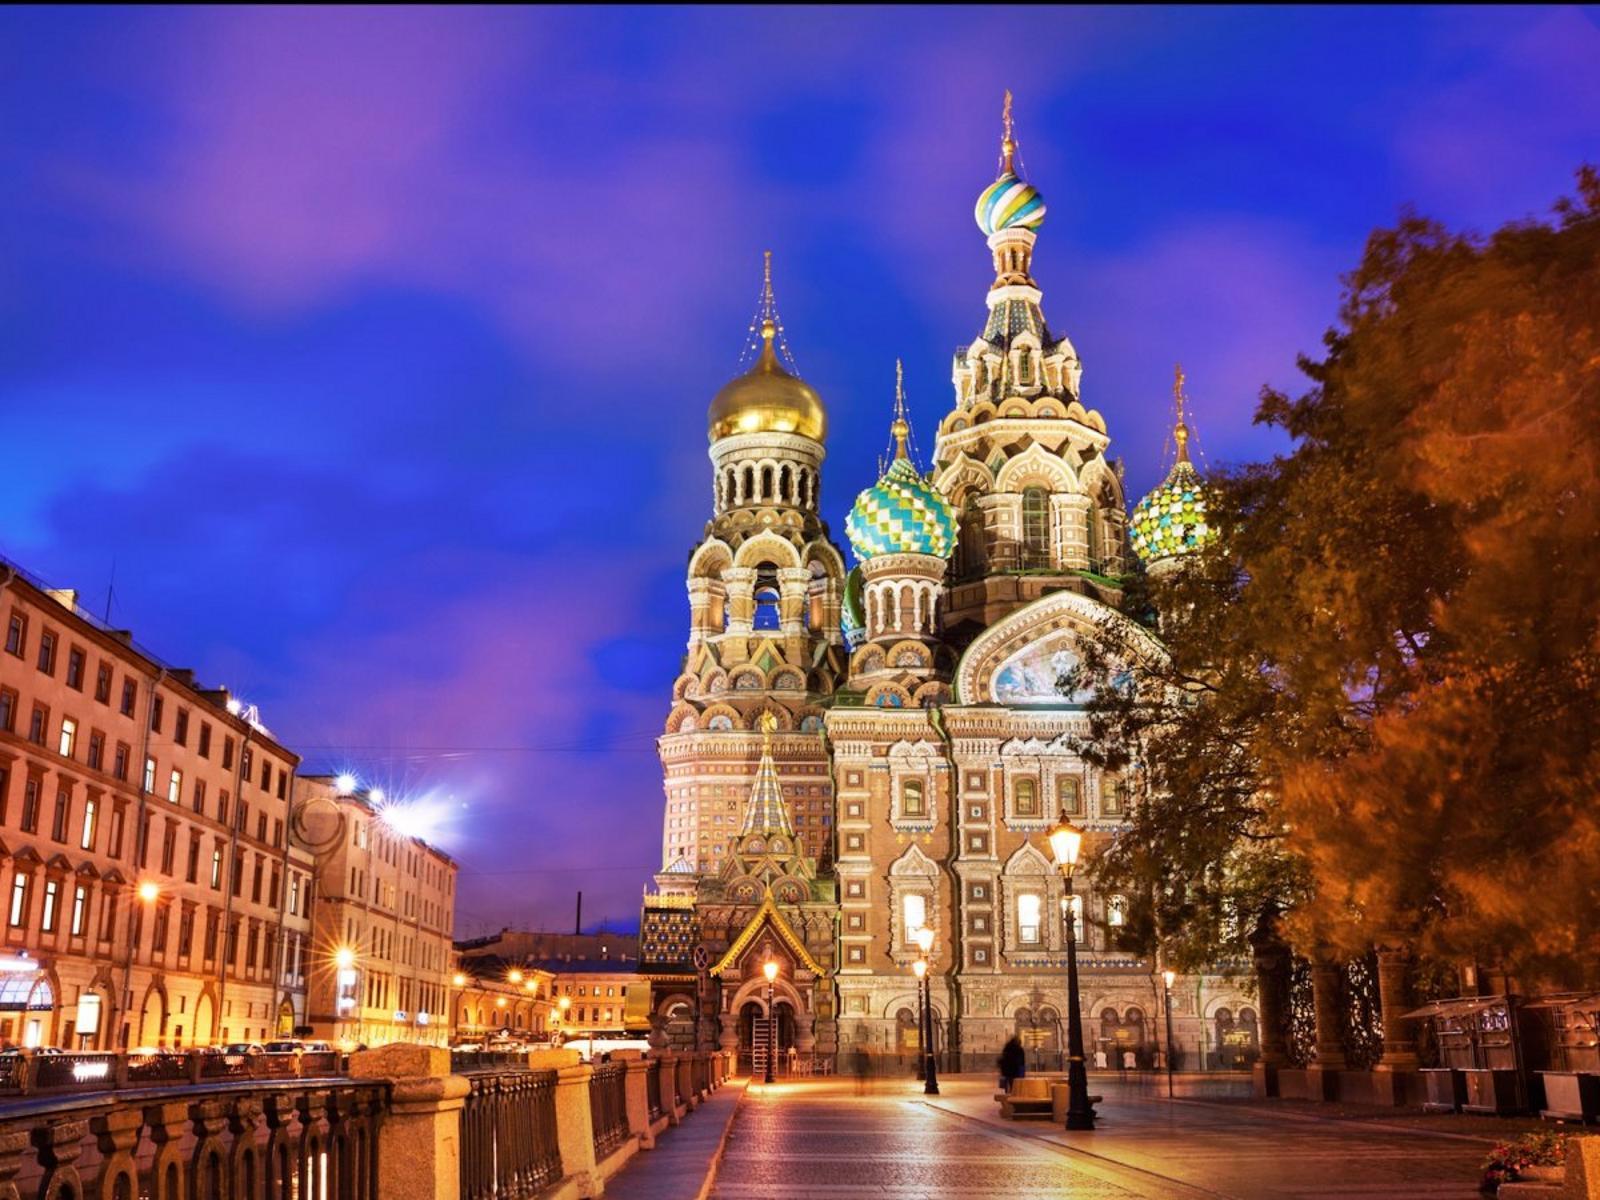 سن پترزبورگ | Saint Petersburg